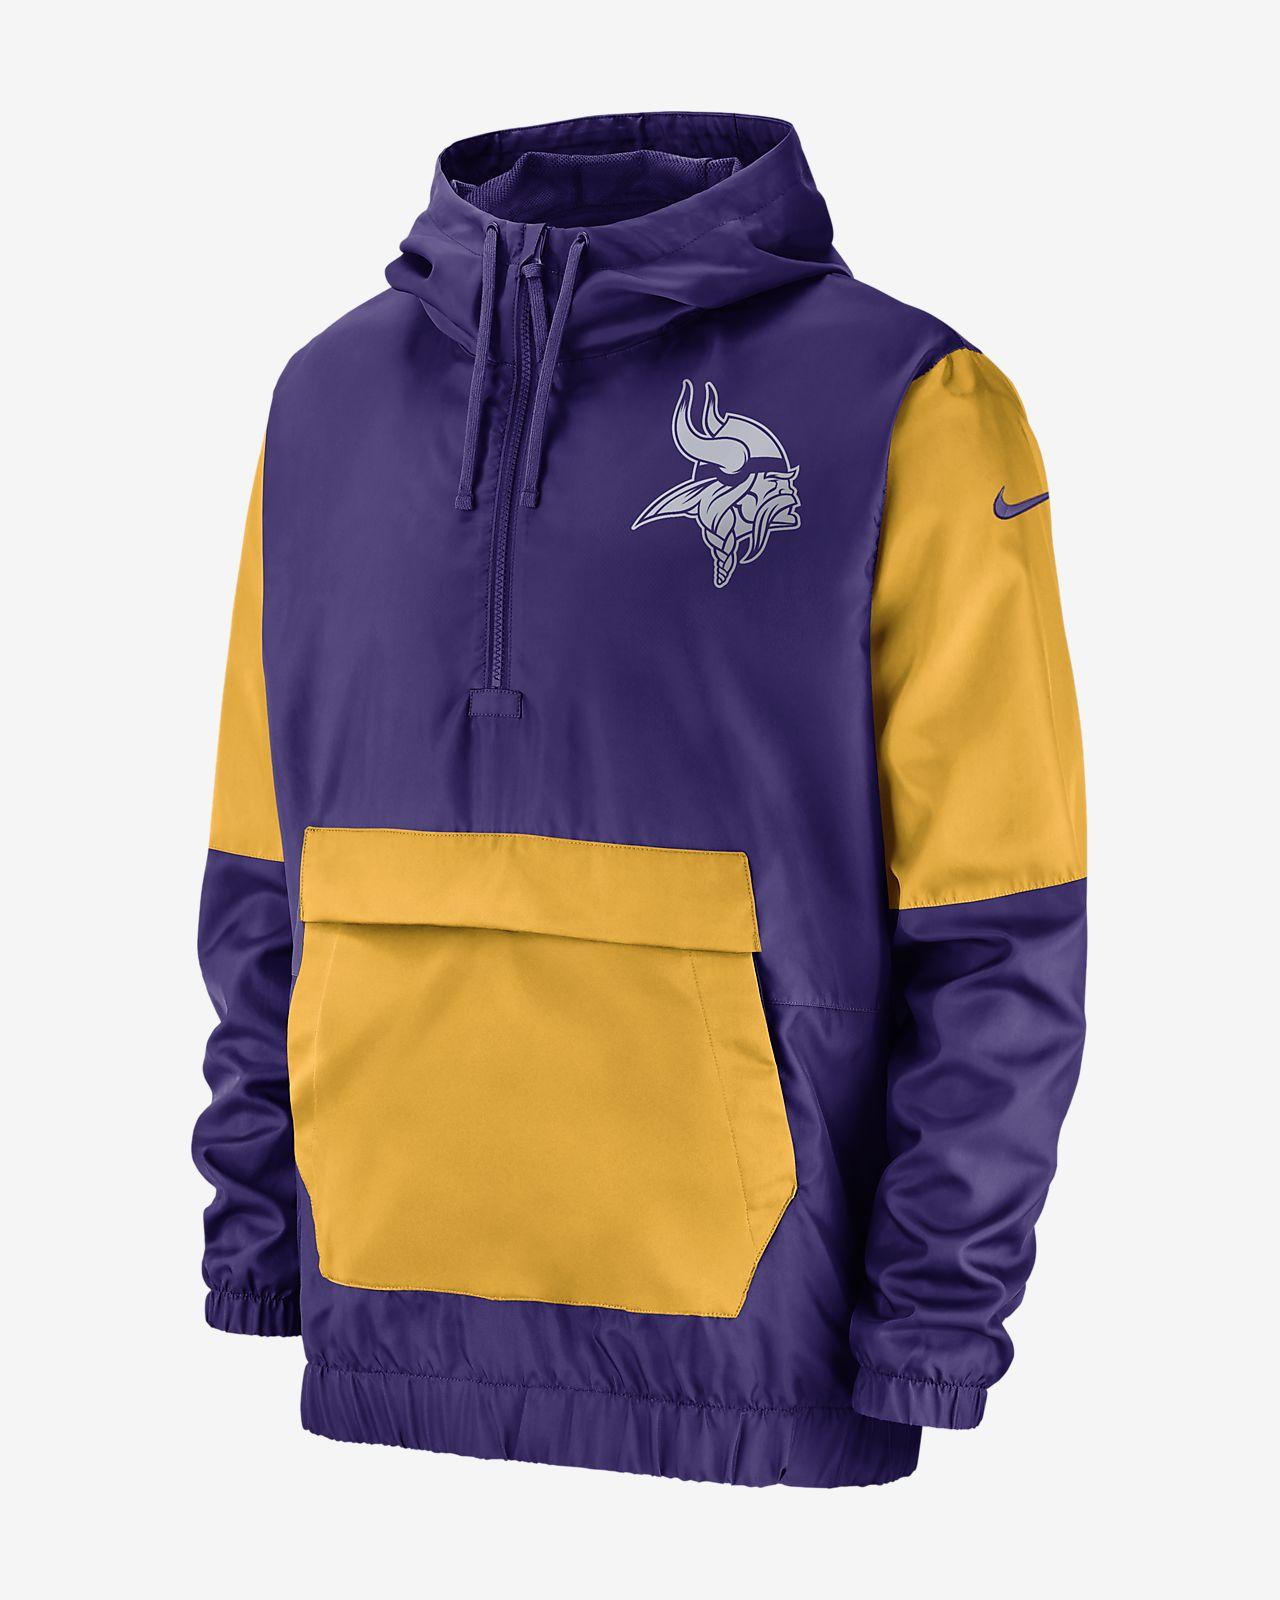 new style 83b12 8b48c Nike Anorak (NFL Vikings) Men's Jacket